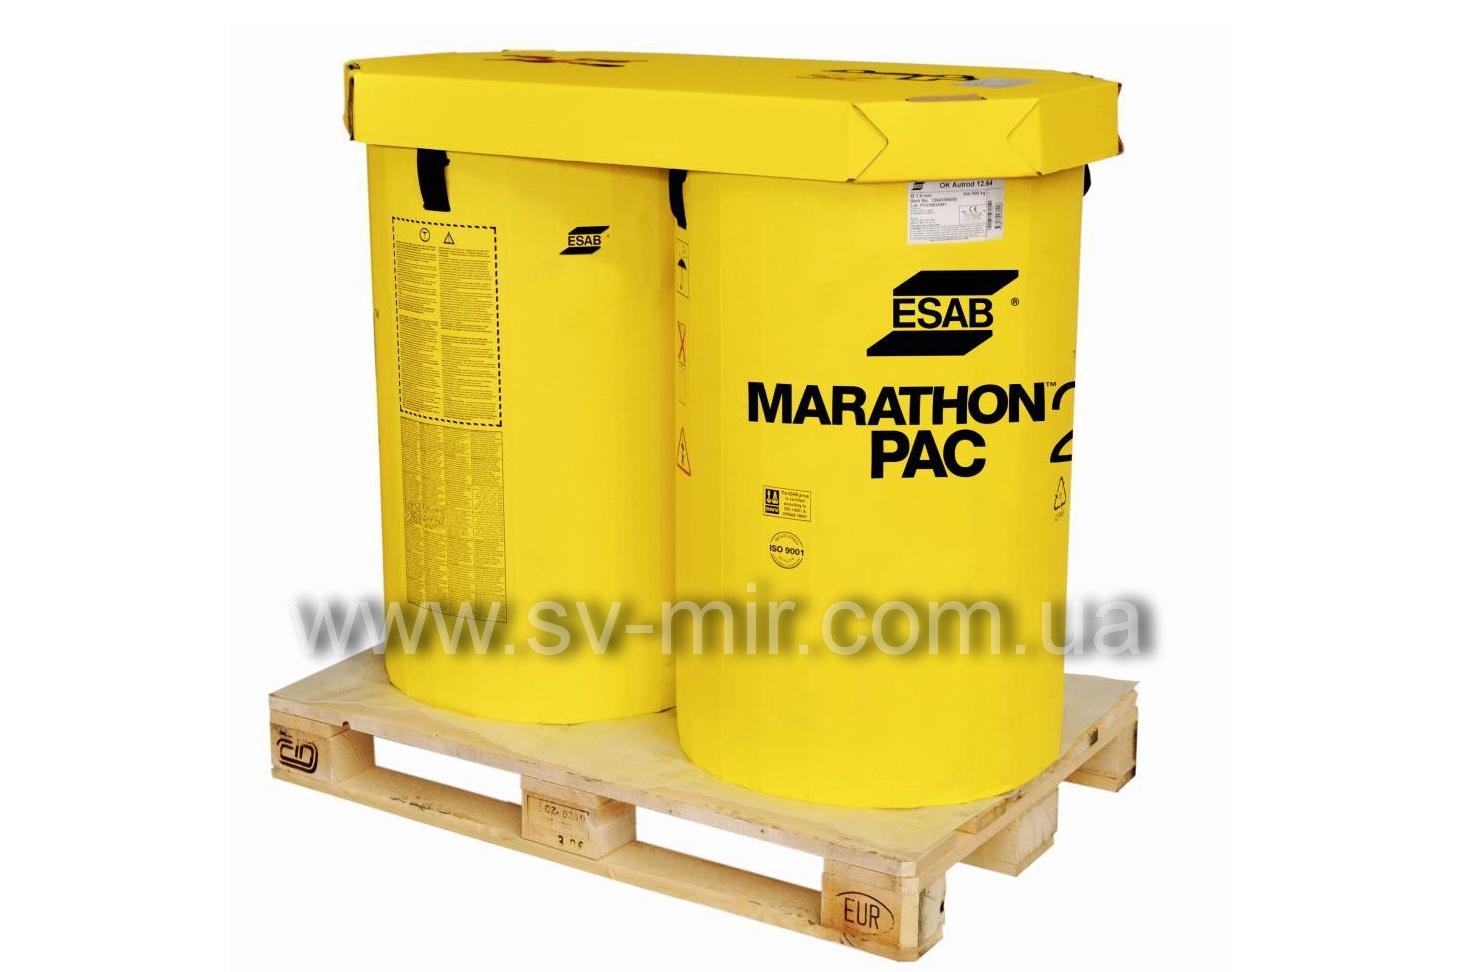 OK-Autrod-12.64-marathon-pac-esab